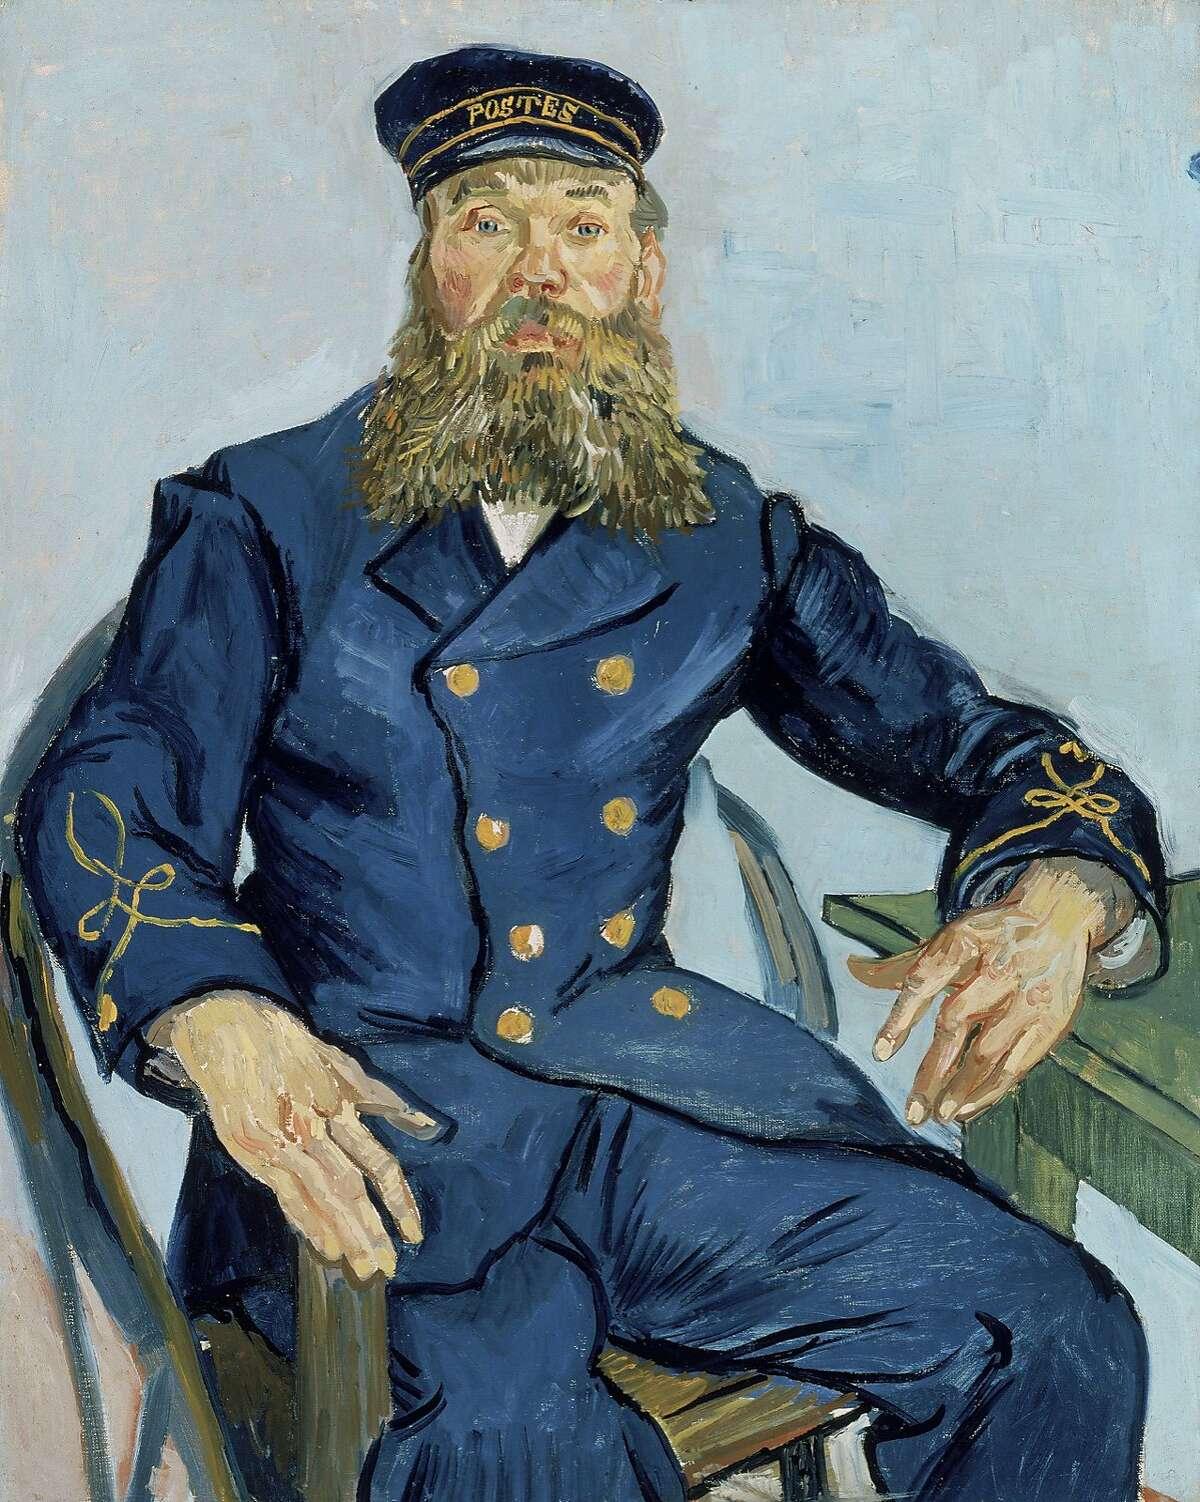 Postman Joseph Roulin, 1888, by Vincent van Gogh (Dutch, 1853Ð1890). Oil on canvas. Museum of Fine Arts, Boston, Gift of Robert Treat Paine, 2nd, 35.1982. Photograph © 2015, MFA, Boston